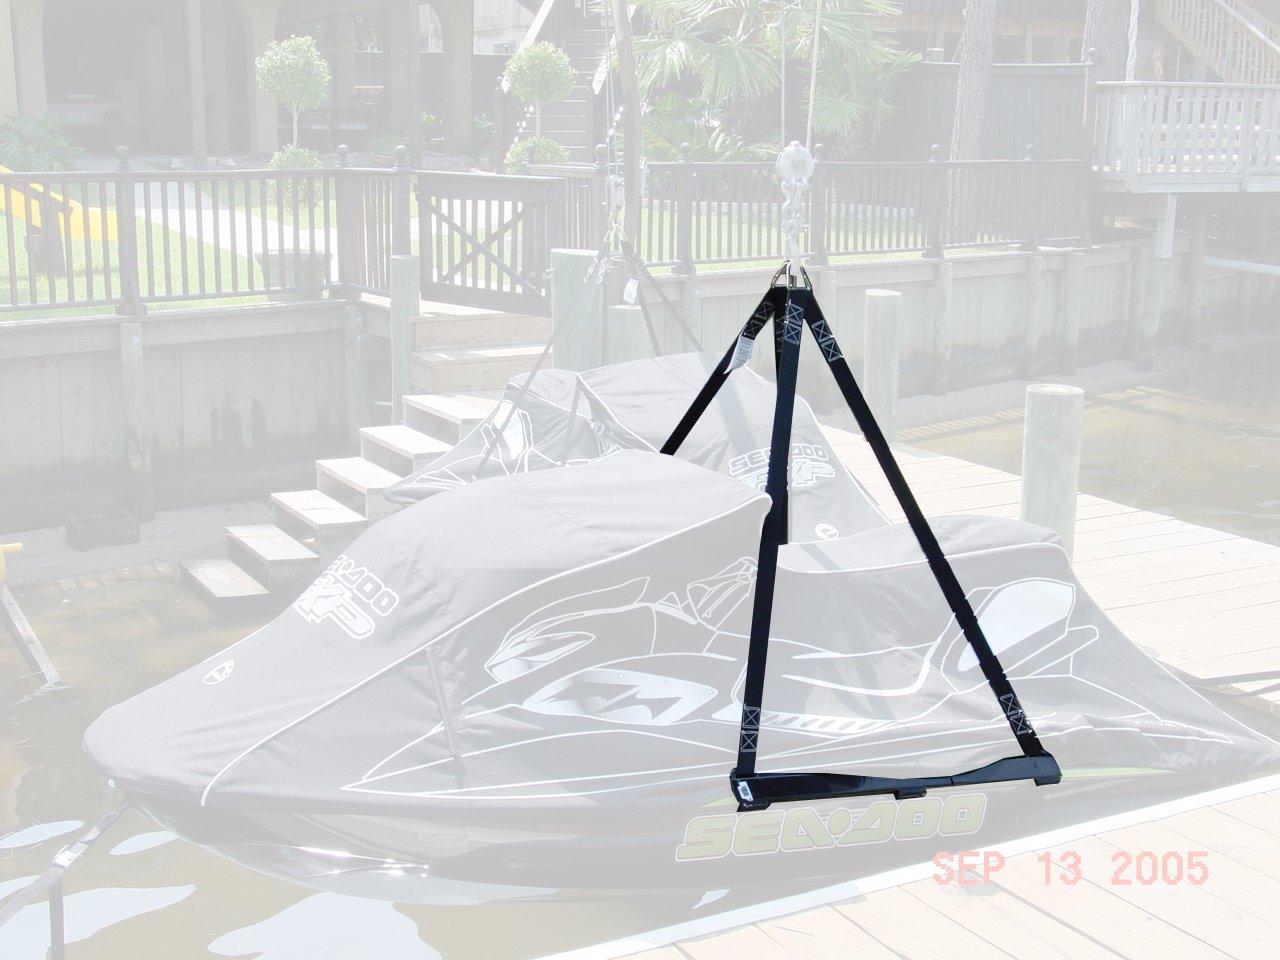 1500 Lb Personal Watercraft PWC Sling Jet Ski Harness by Prohoists